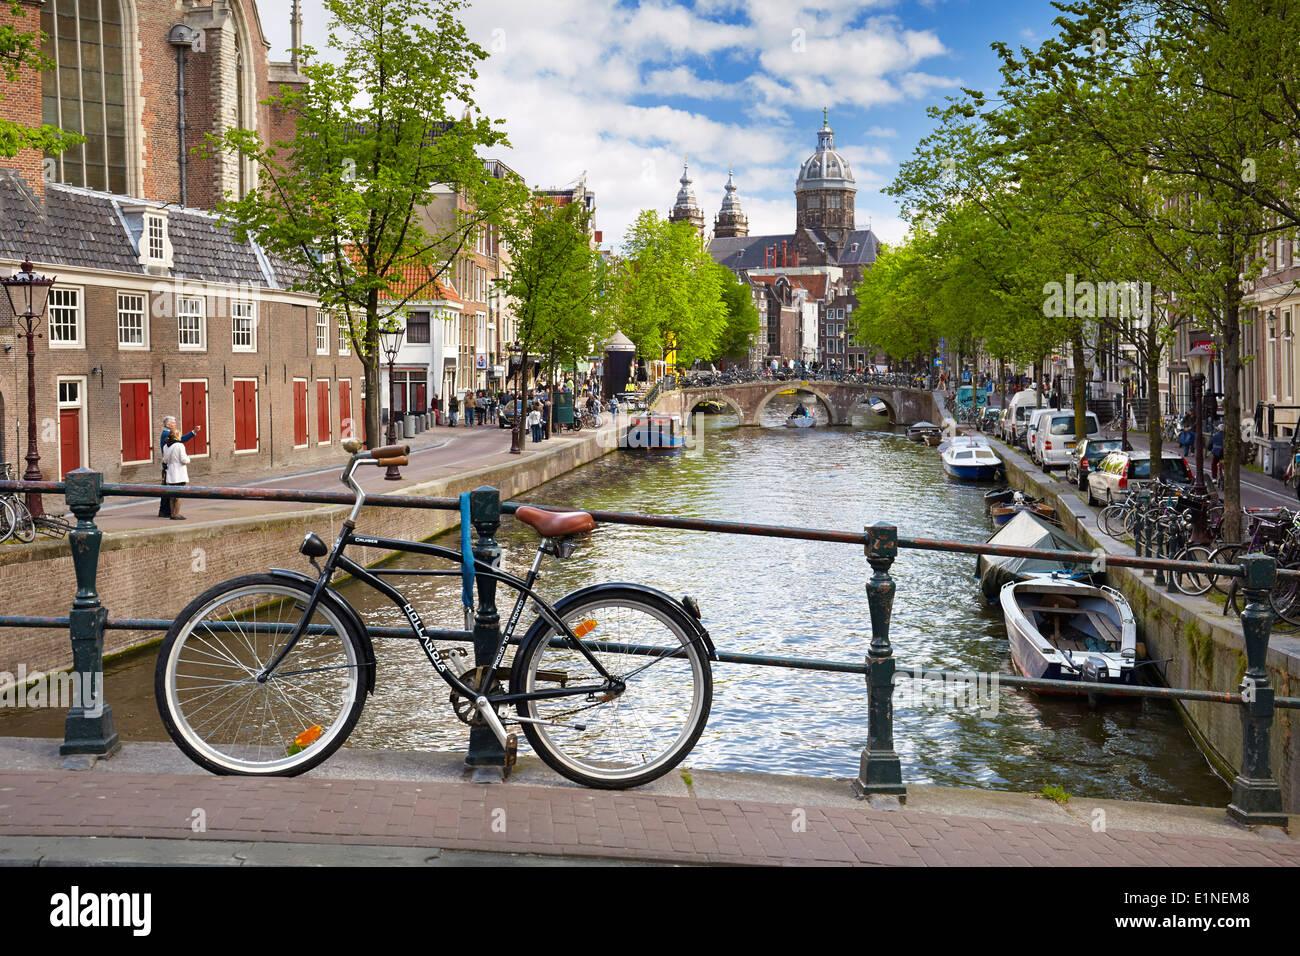 fahrrad in amsterdam street holland niederlande stockfoto. Black Bedroom Furniture Sets. Home Design Ideas